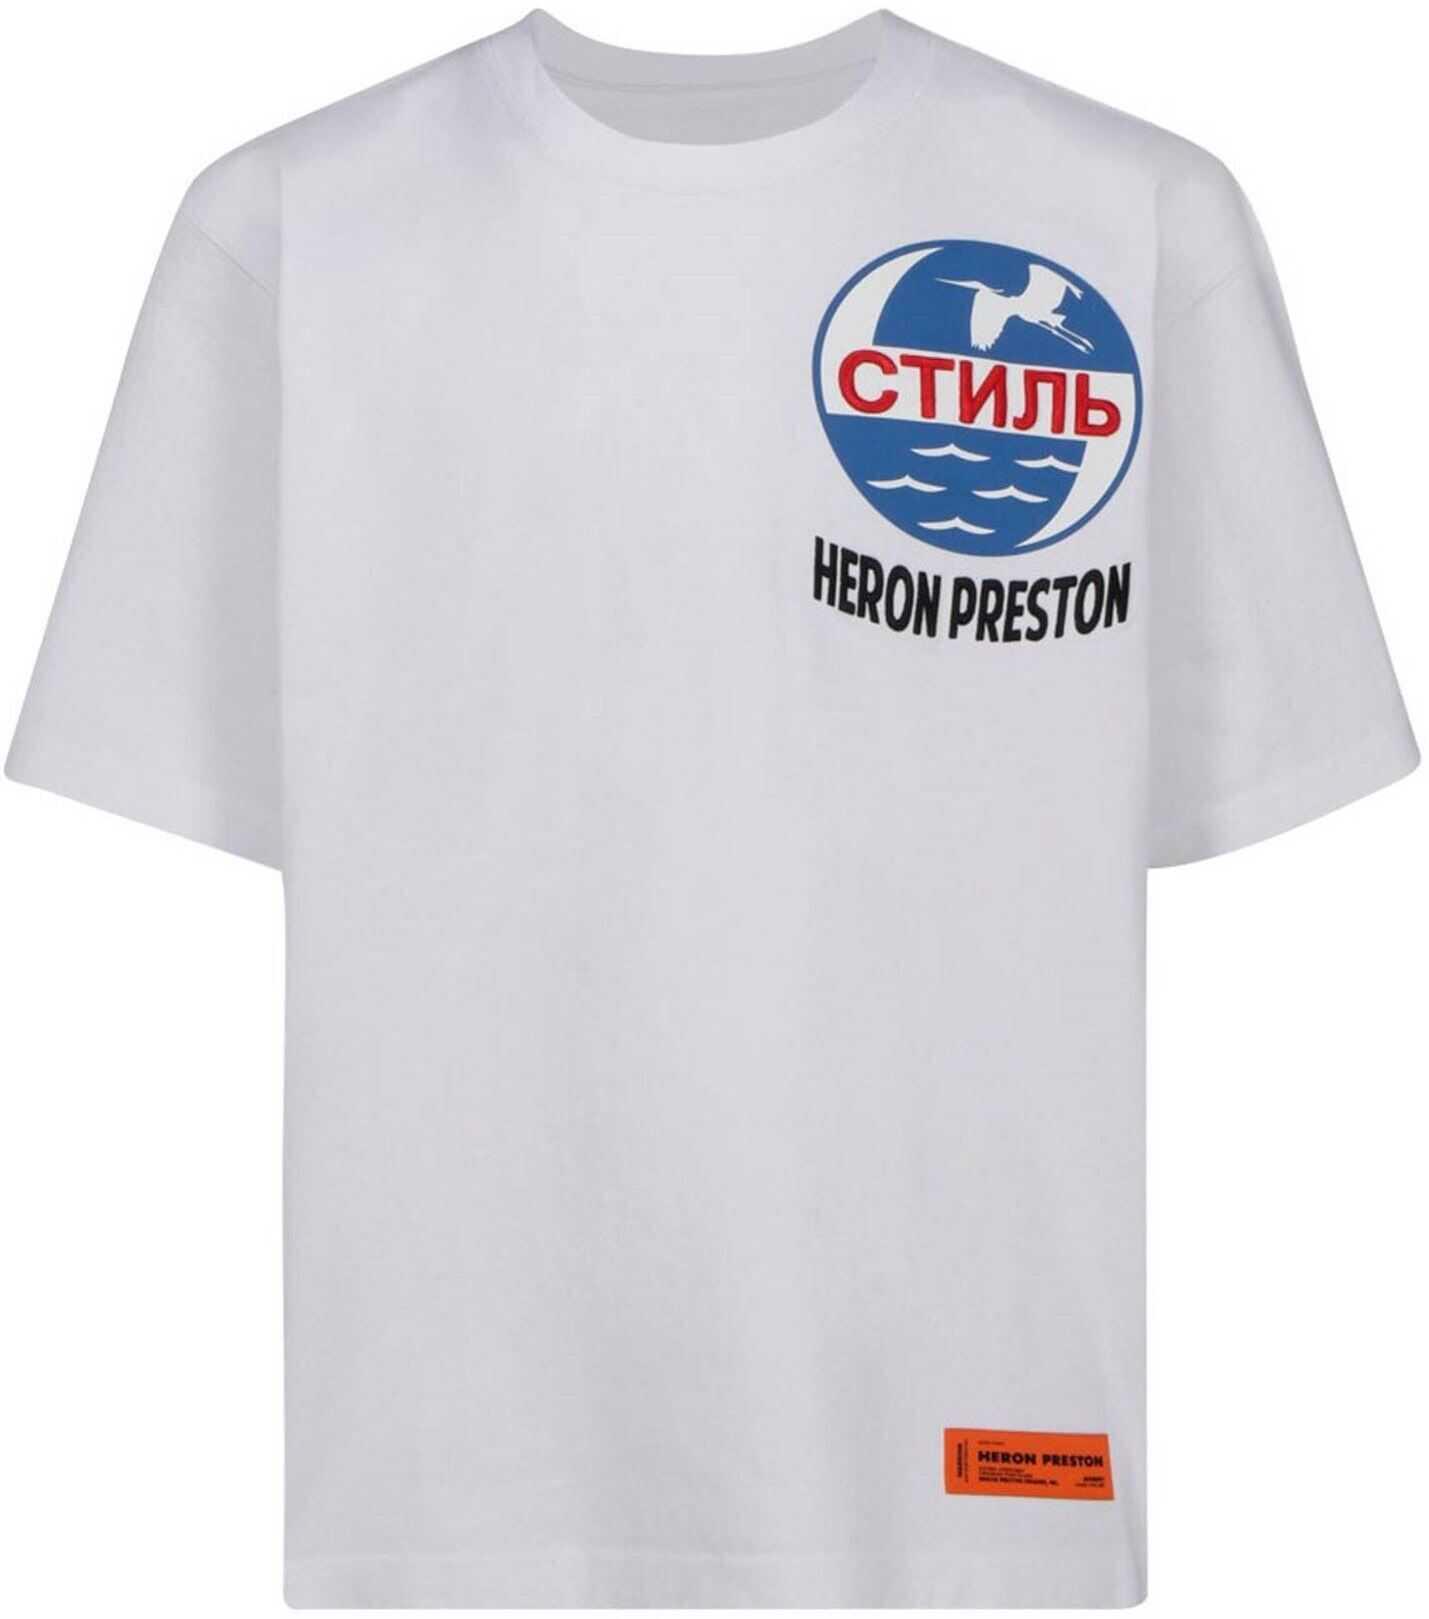 Стиль Inc S/S T-Shirt In White